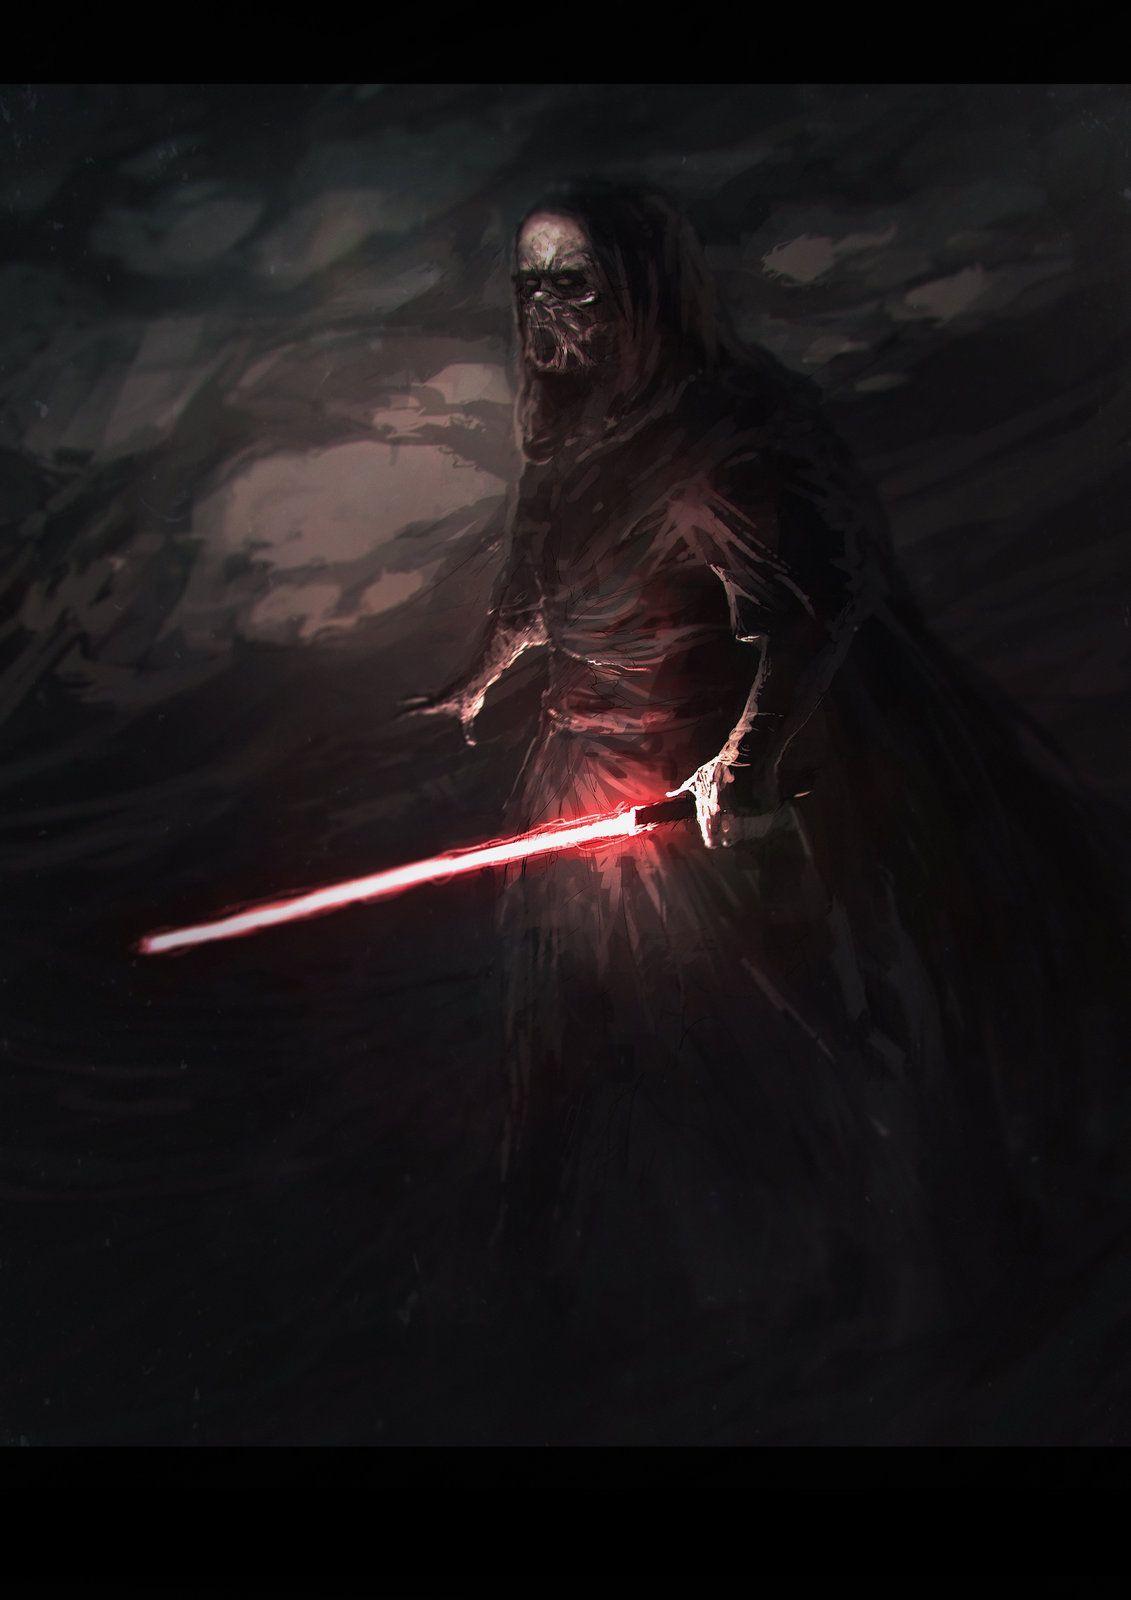 Red fear, Mauro Mussi on ArtStation at https://www.artstation.com/artwork/zOXvL